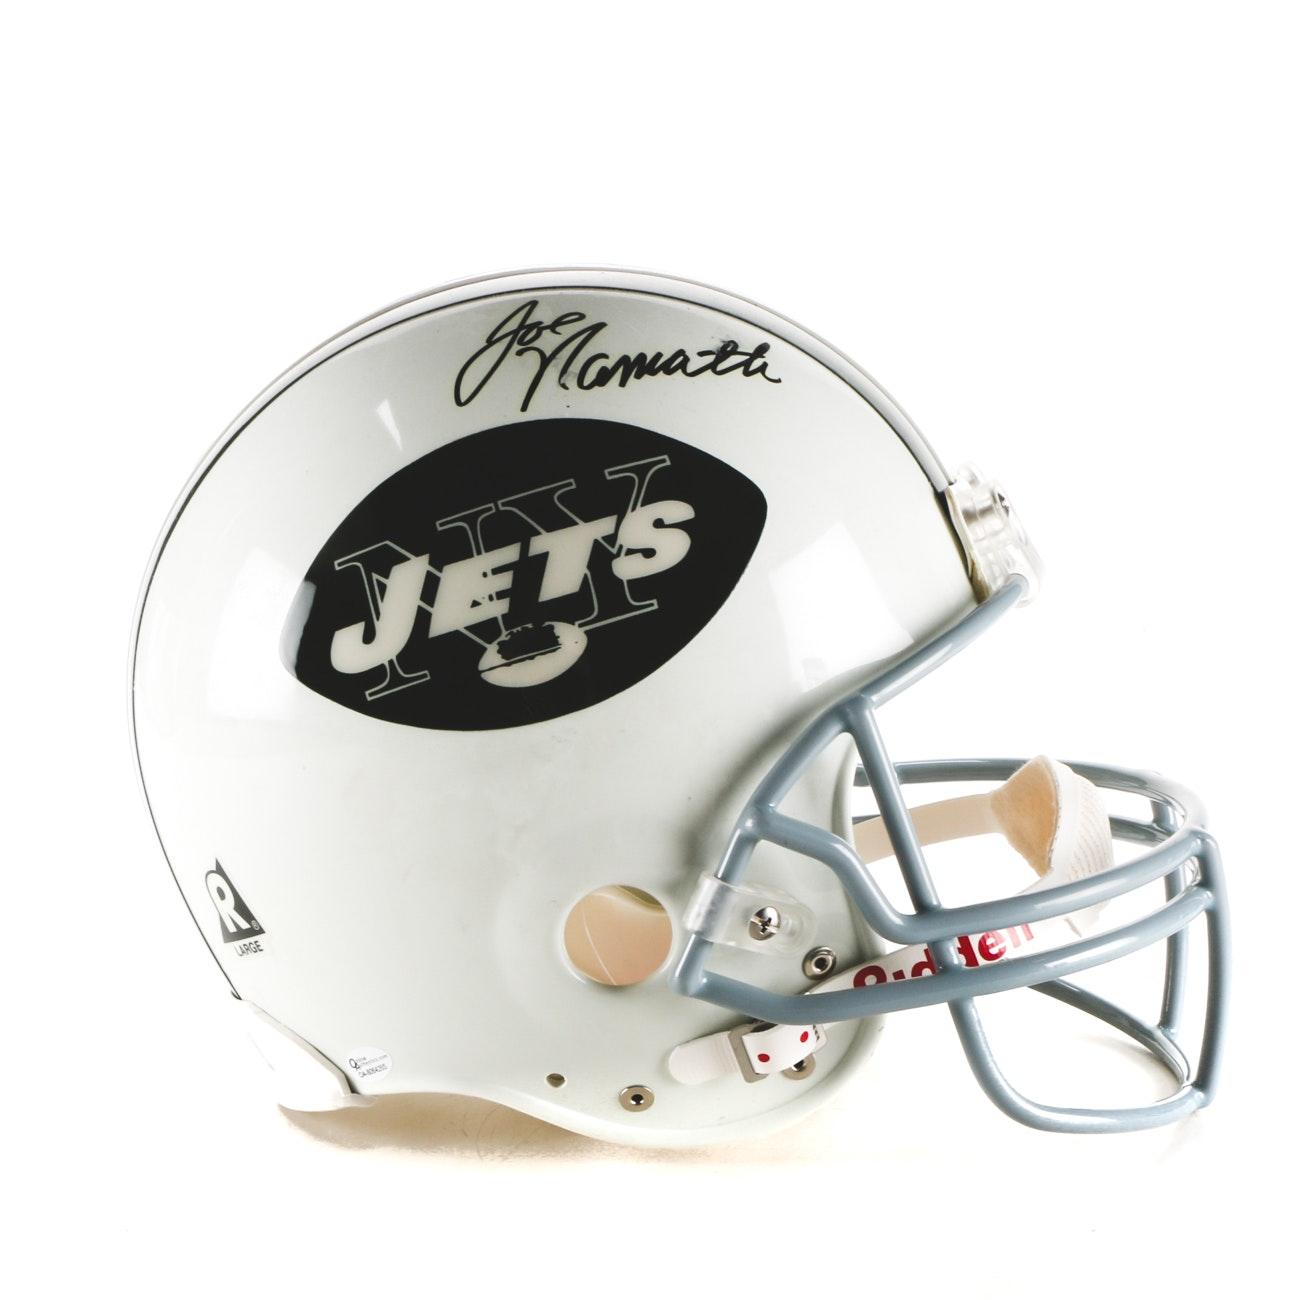 Joe Namath Signed Full Size Helmet  COA